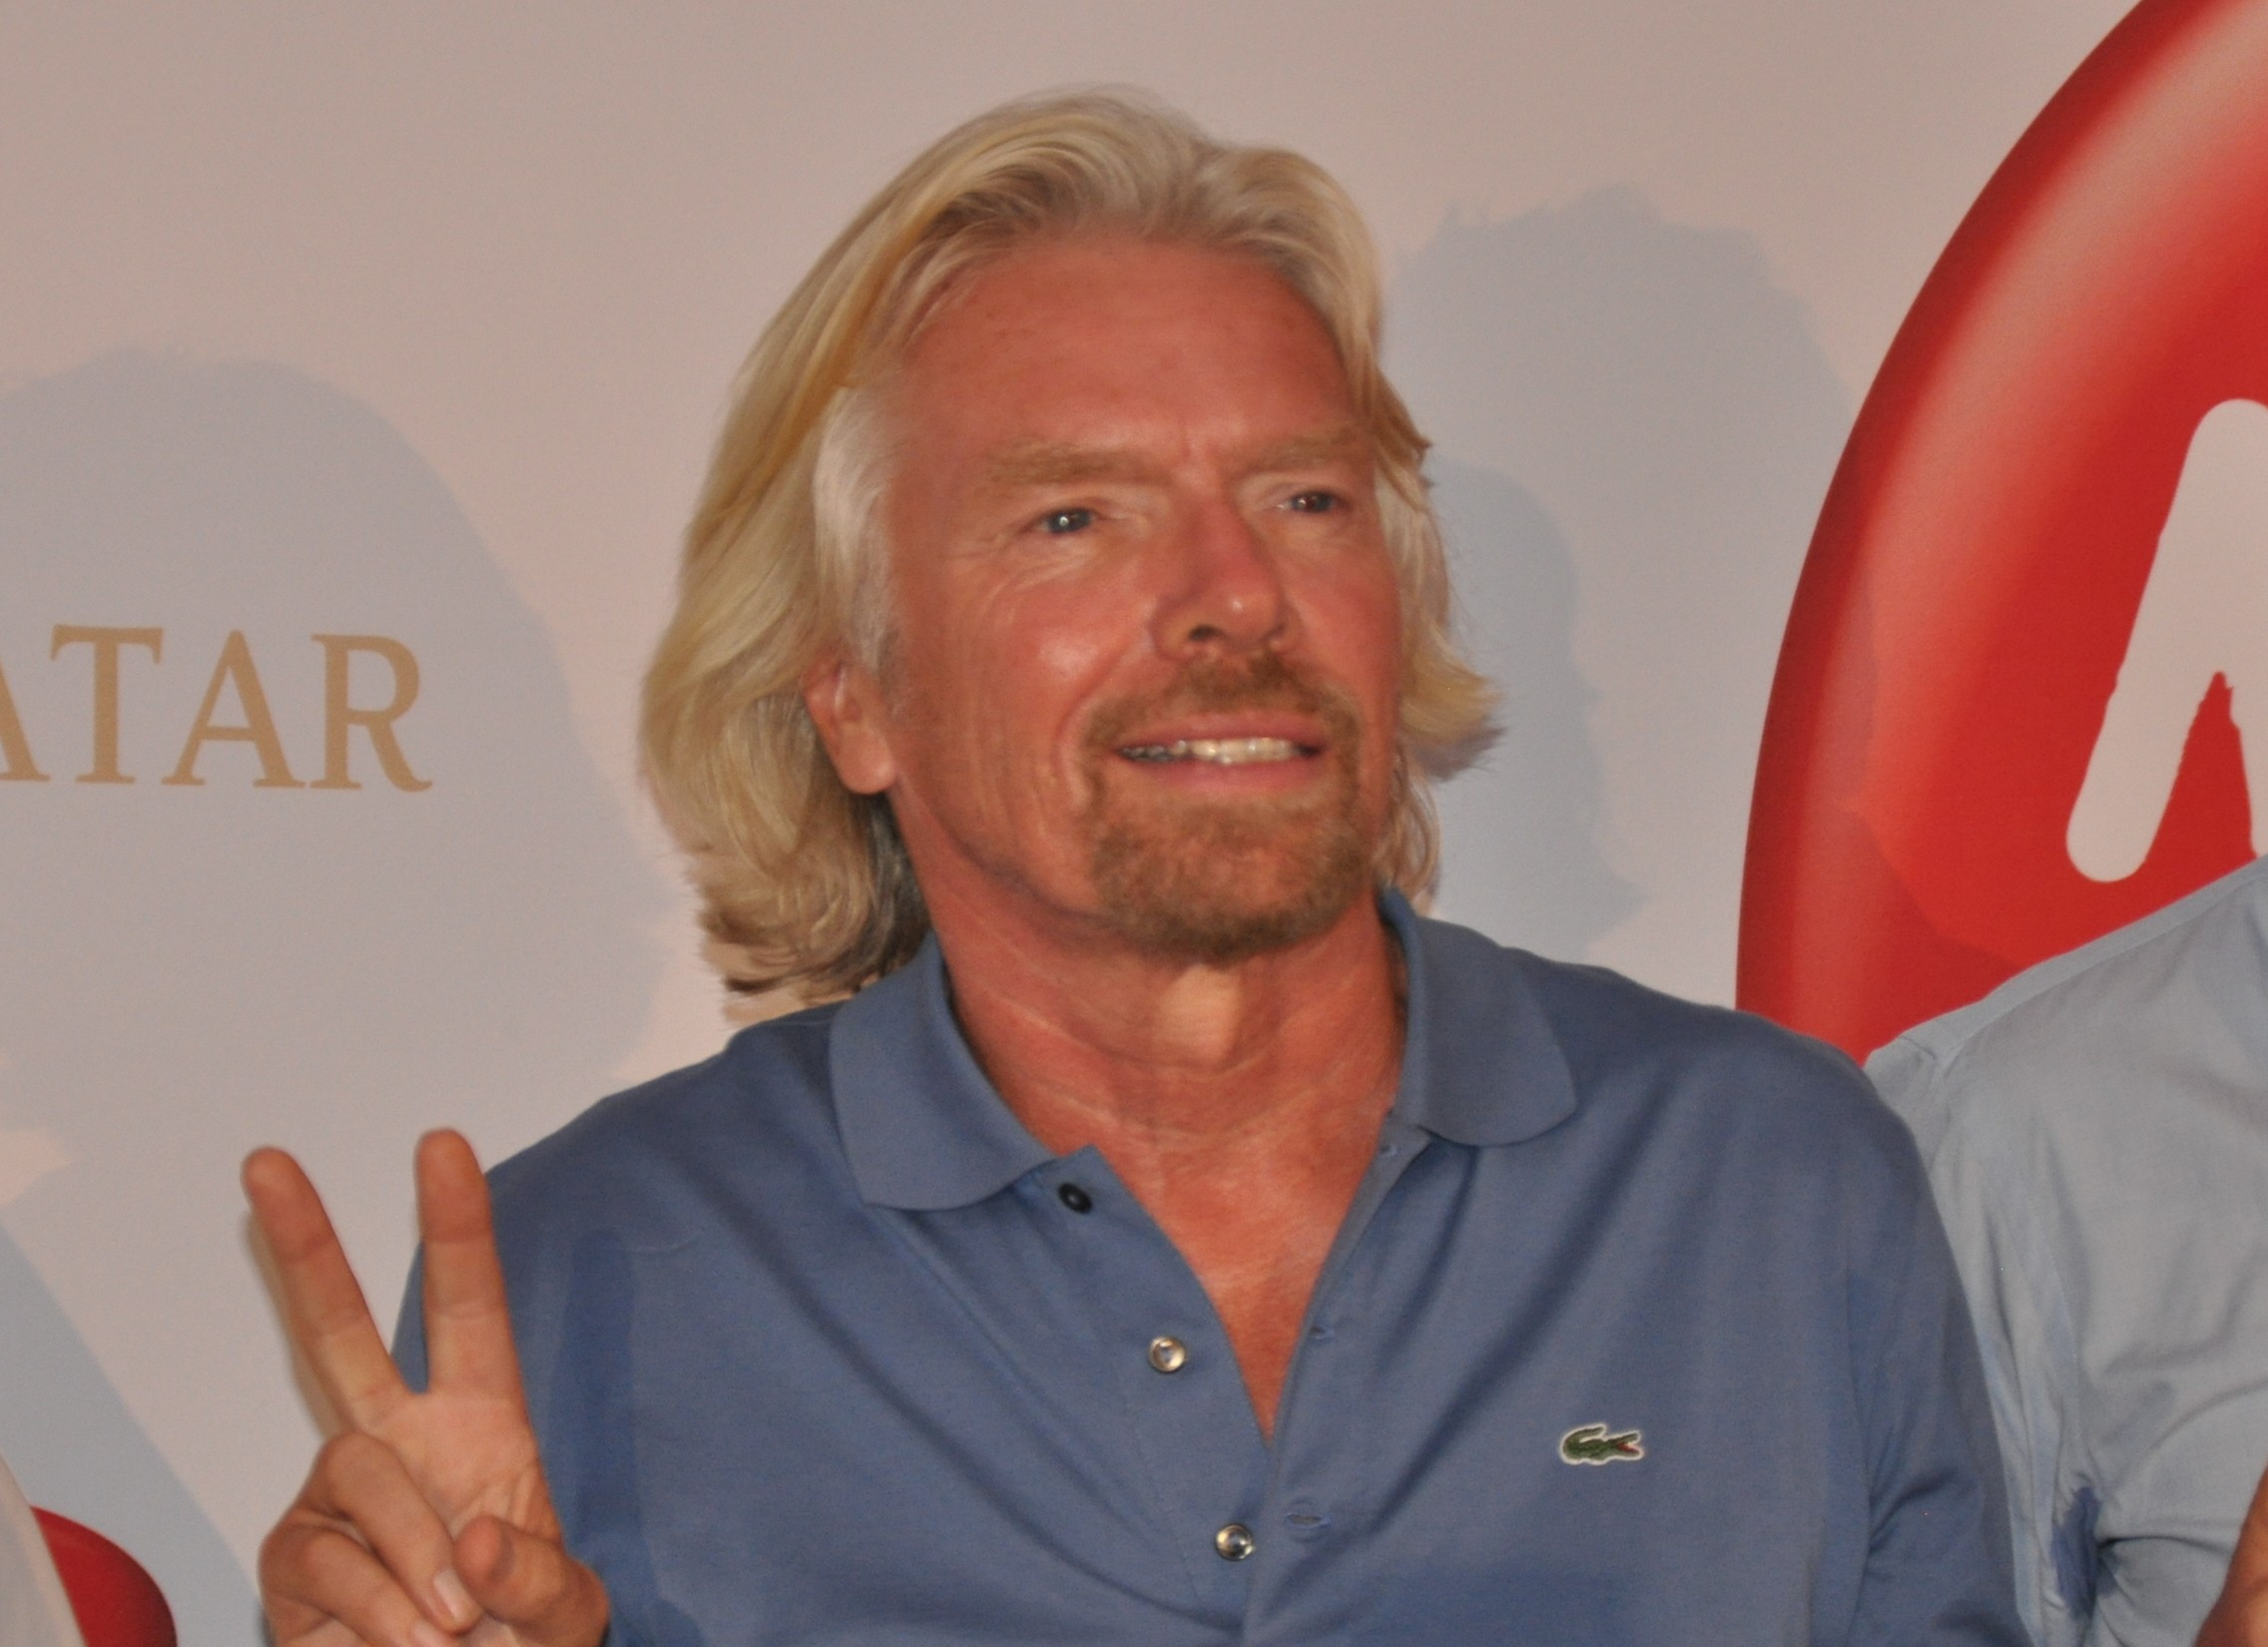 Ryanair Boss Michael O'Leary Calls Virgin's Richard Branson 'Autistic'